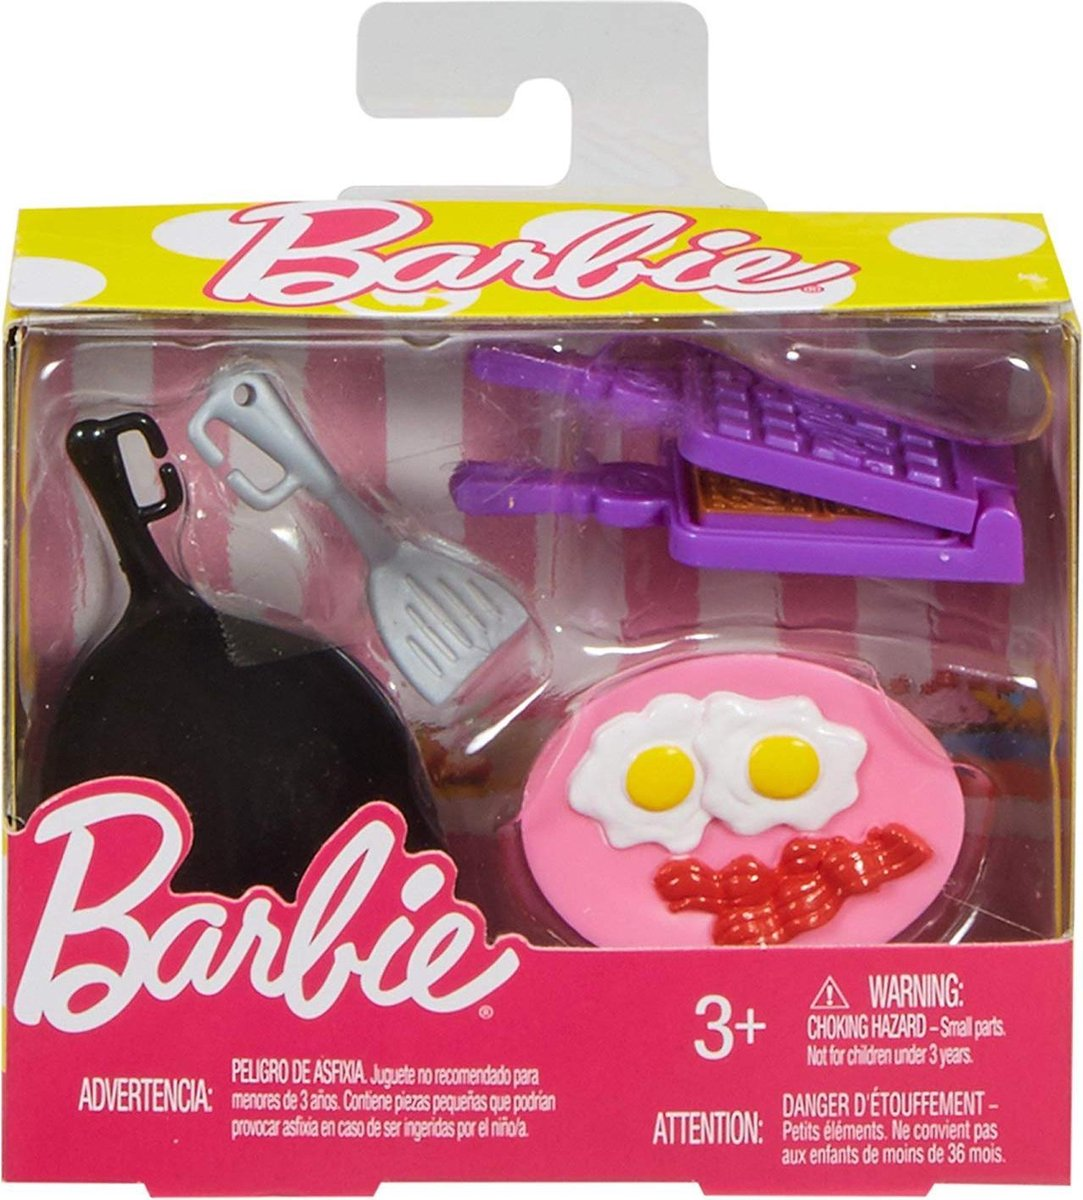 Barbie - Koken Set